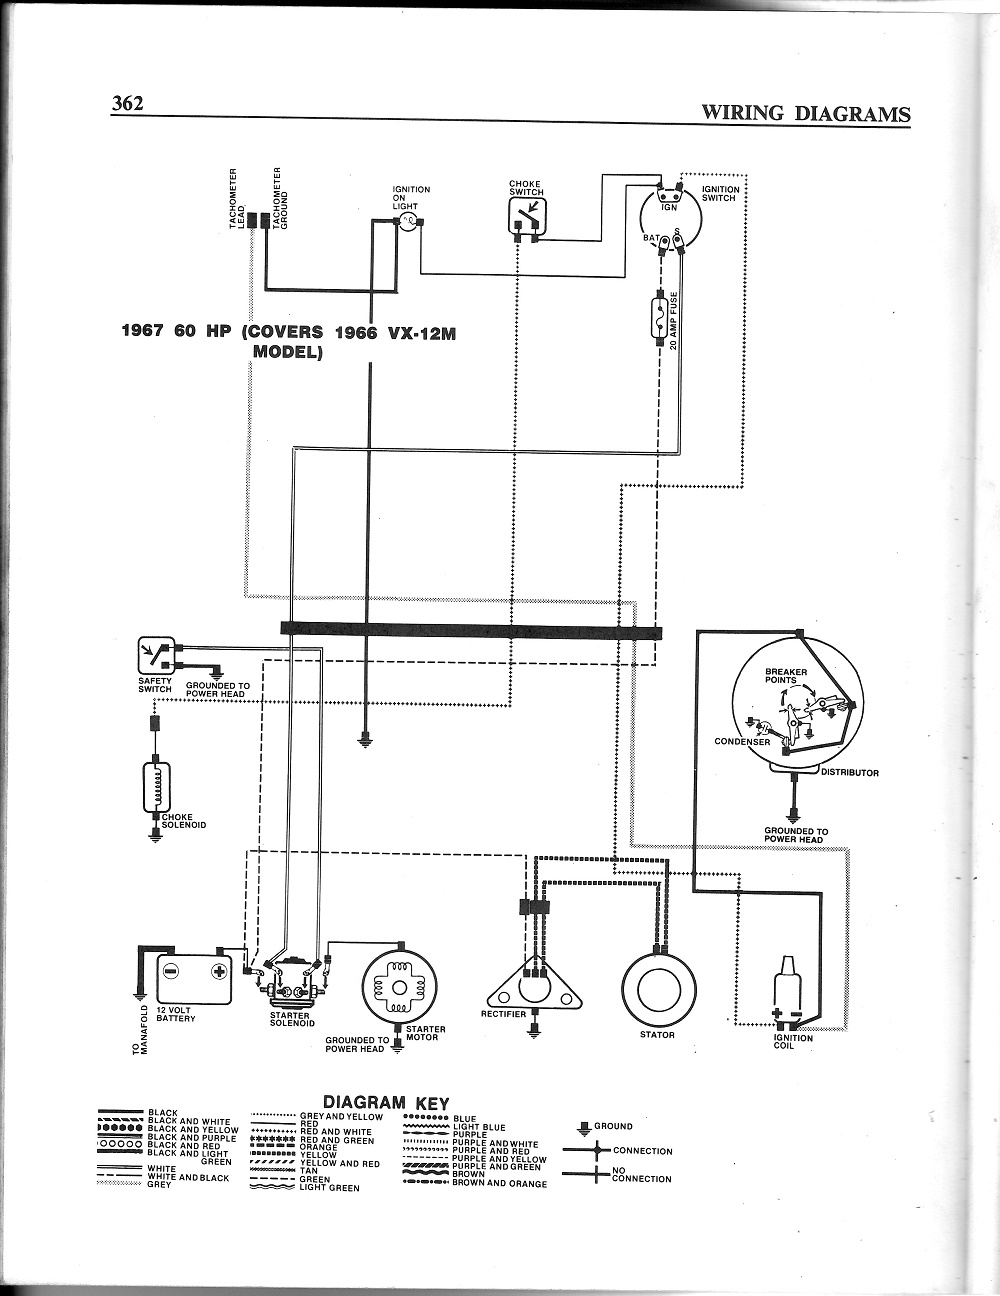 hight resolution of lark wiring diagram wiring library wiring diagram for 1964 studebaker postal zip van 8e5 fc model